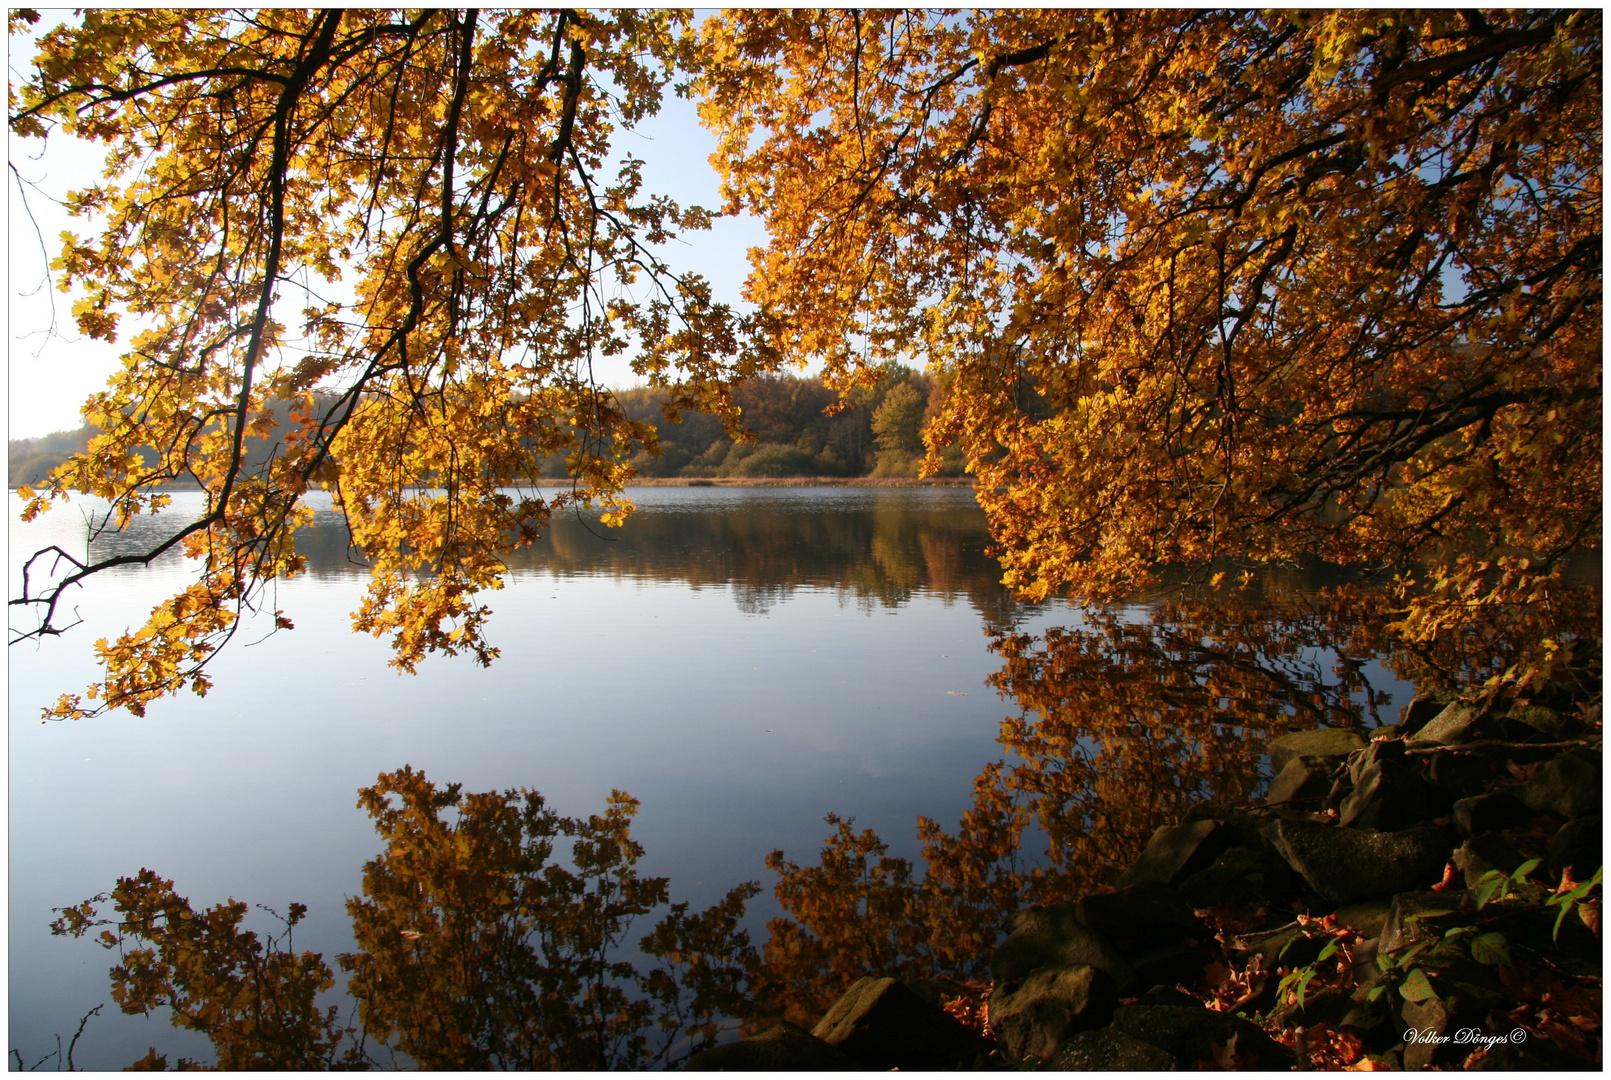 Herbst an der Westerwälder Seenplatte